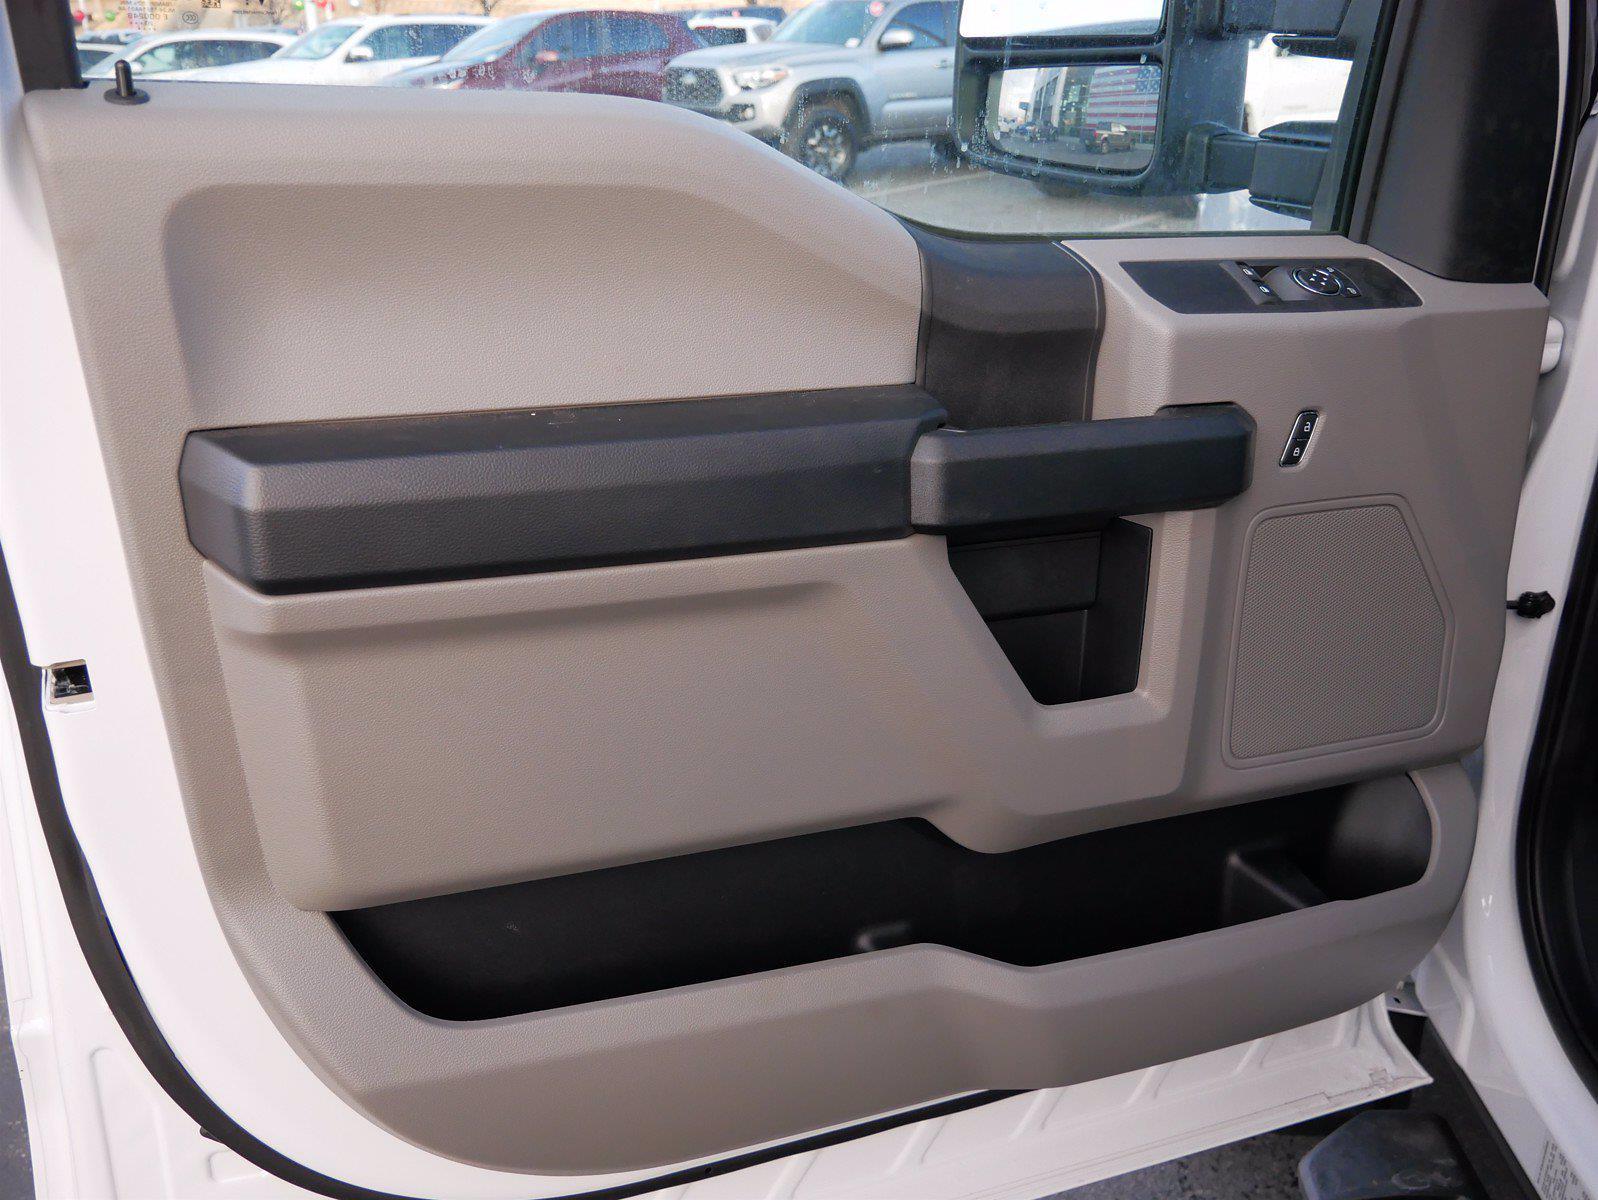 2021 Ford F-550 Regular Cab DRW 4x4, Scelzi Dump Body #64083 - photo 11